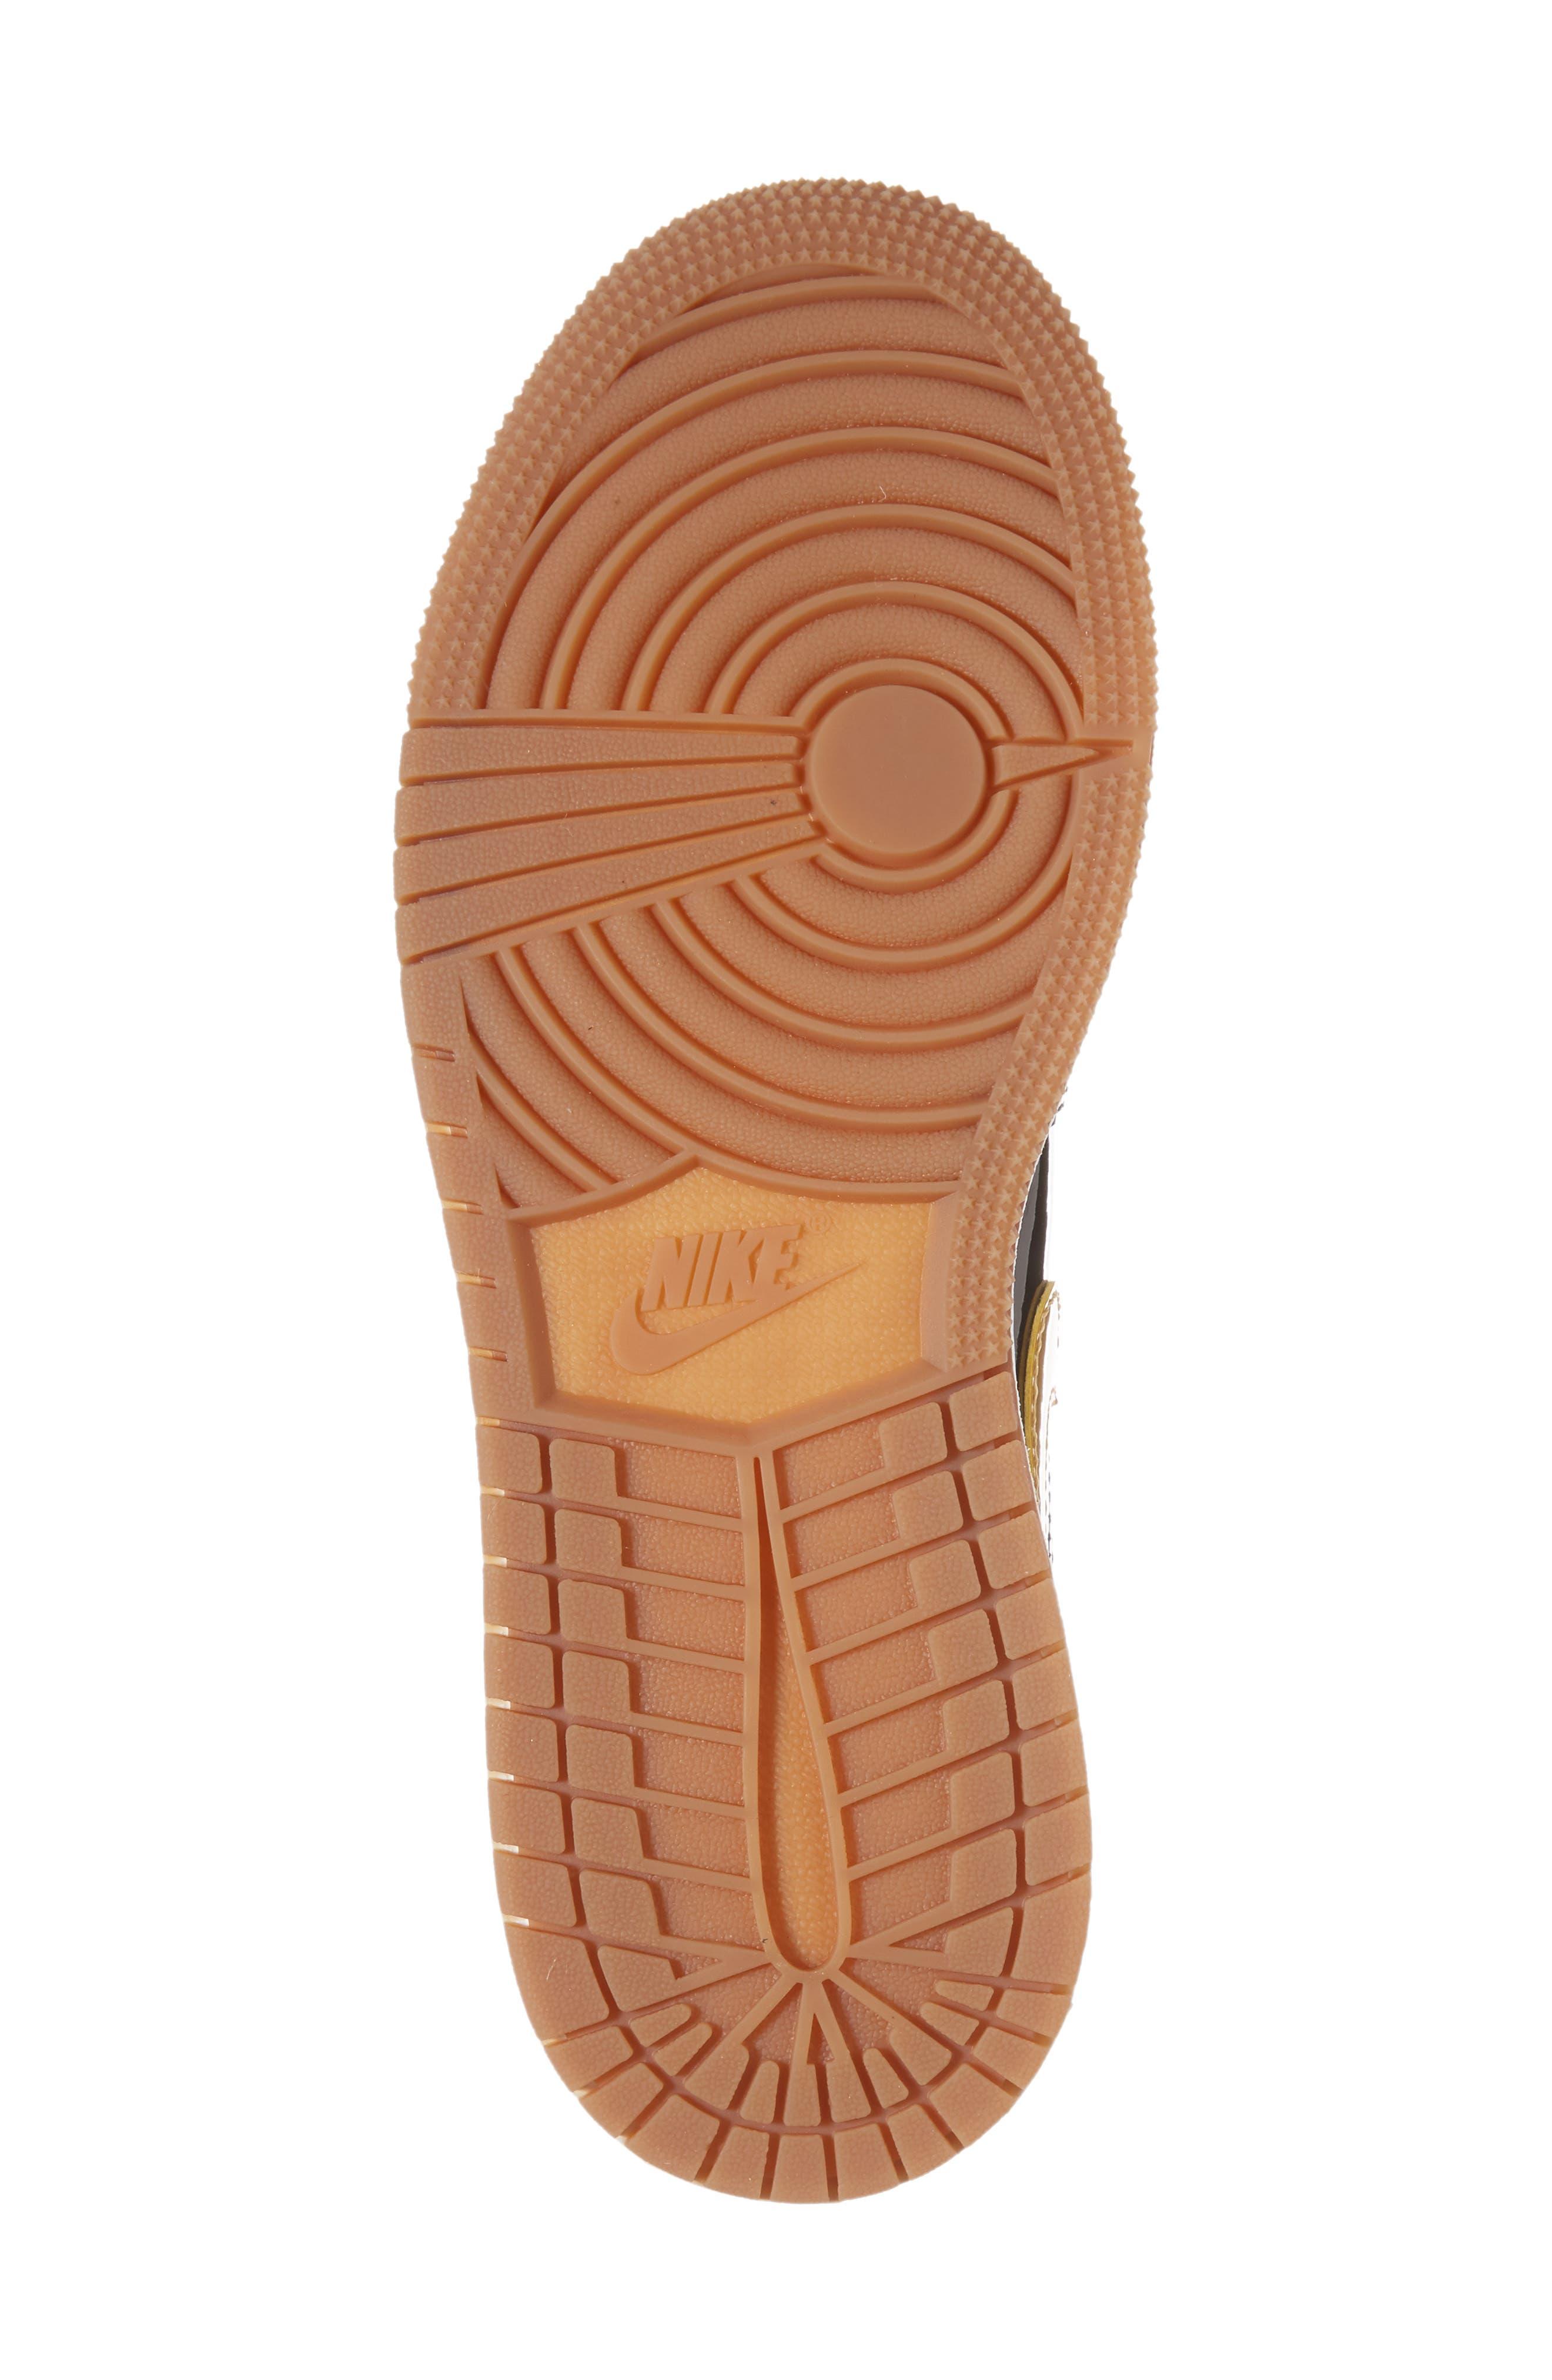 Nike 'Jordan 1 Low' Basketball Shoe,                             Alternate thumbnail 6, color,                             Black/ Metallic Gold/ White